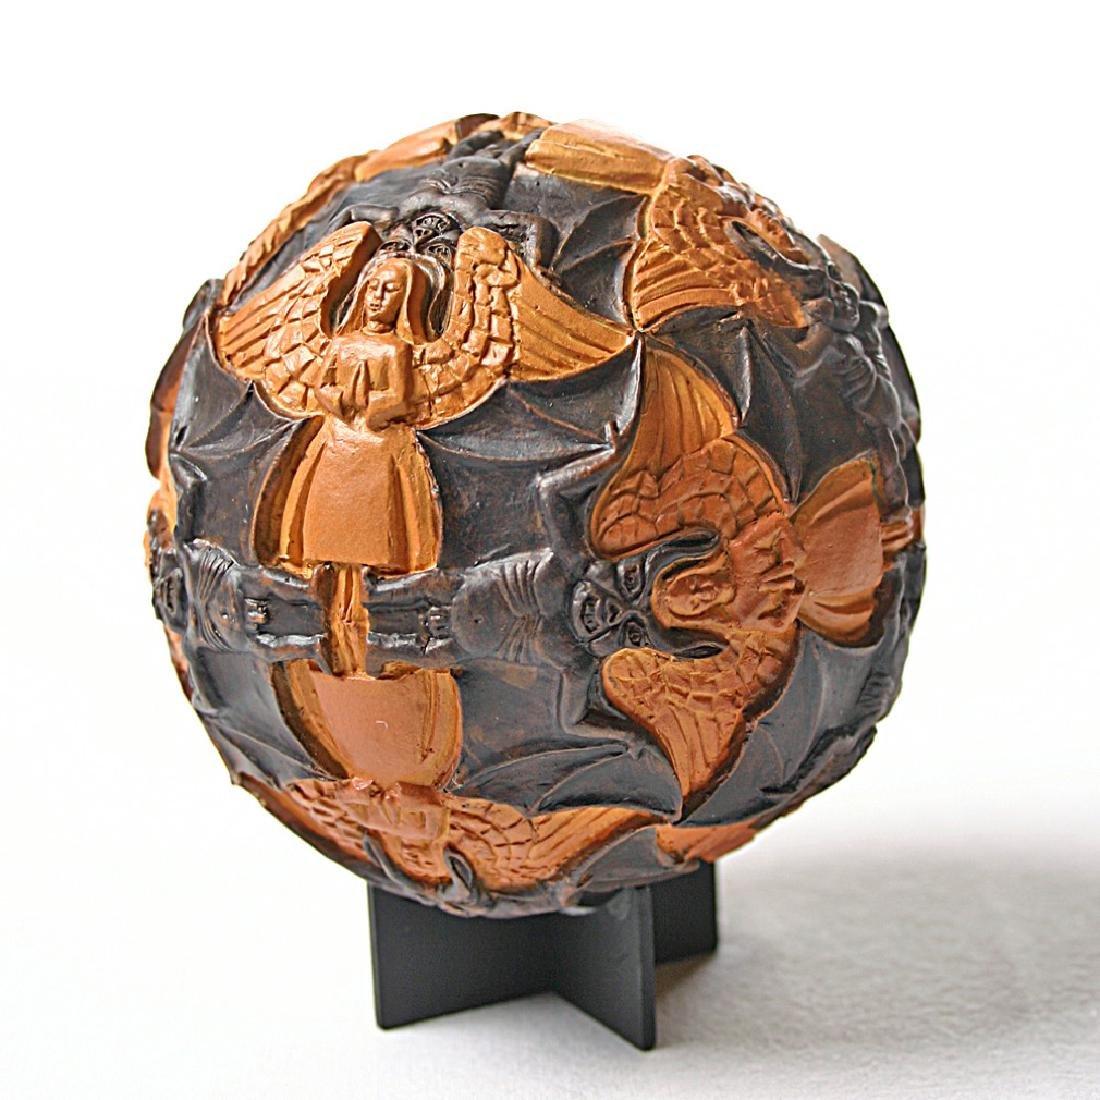 After Maurits Escher: Sphere Angels & Devils Statue